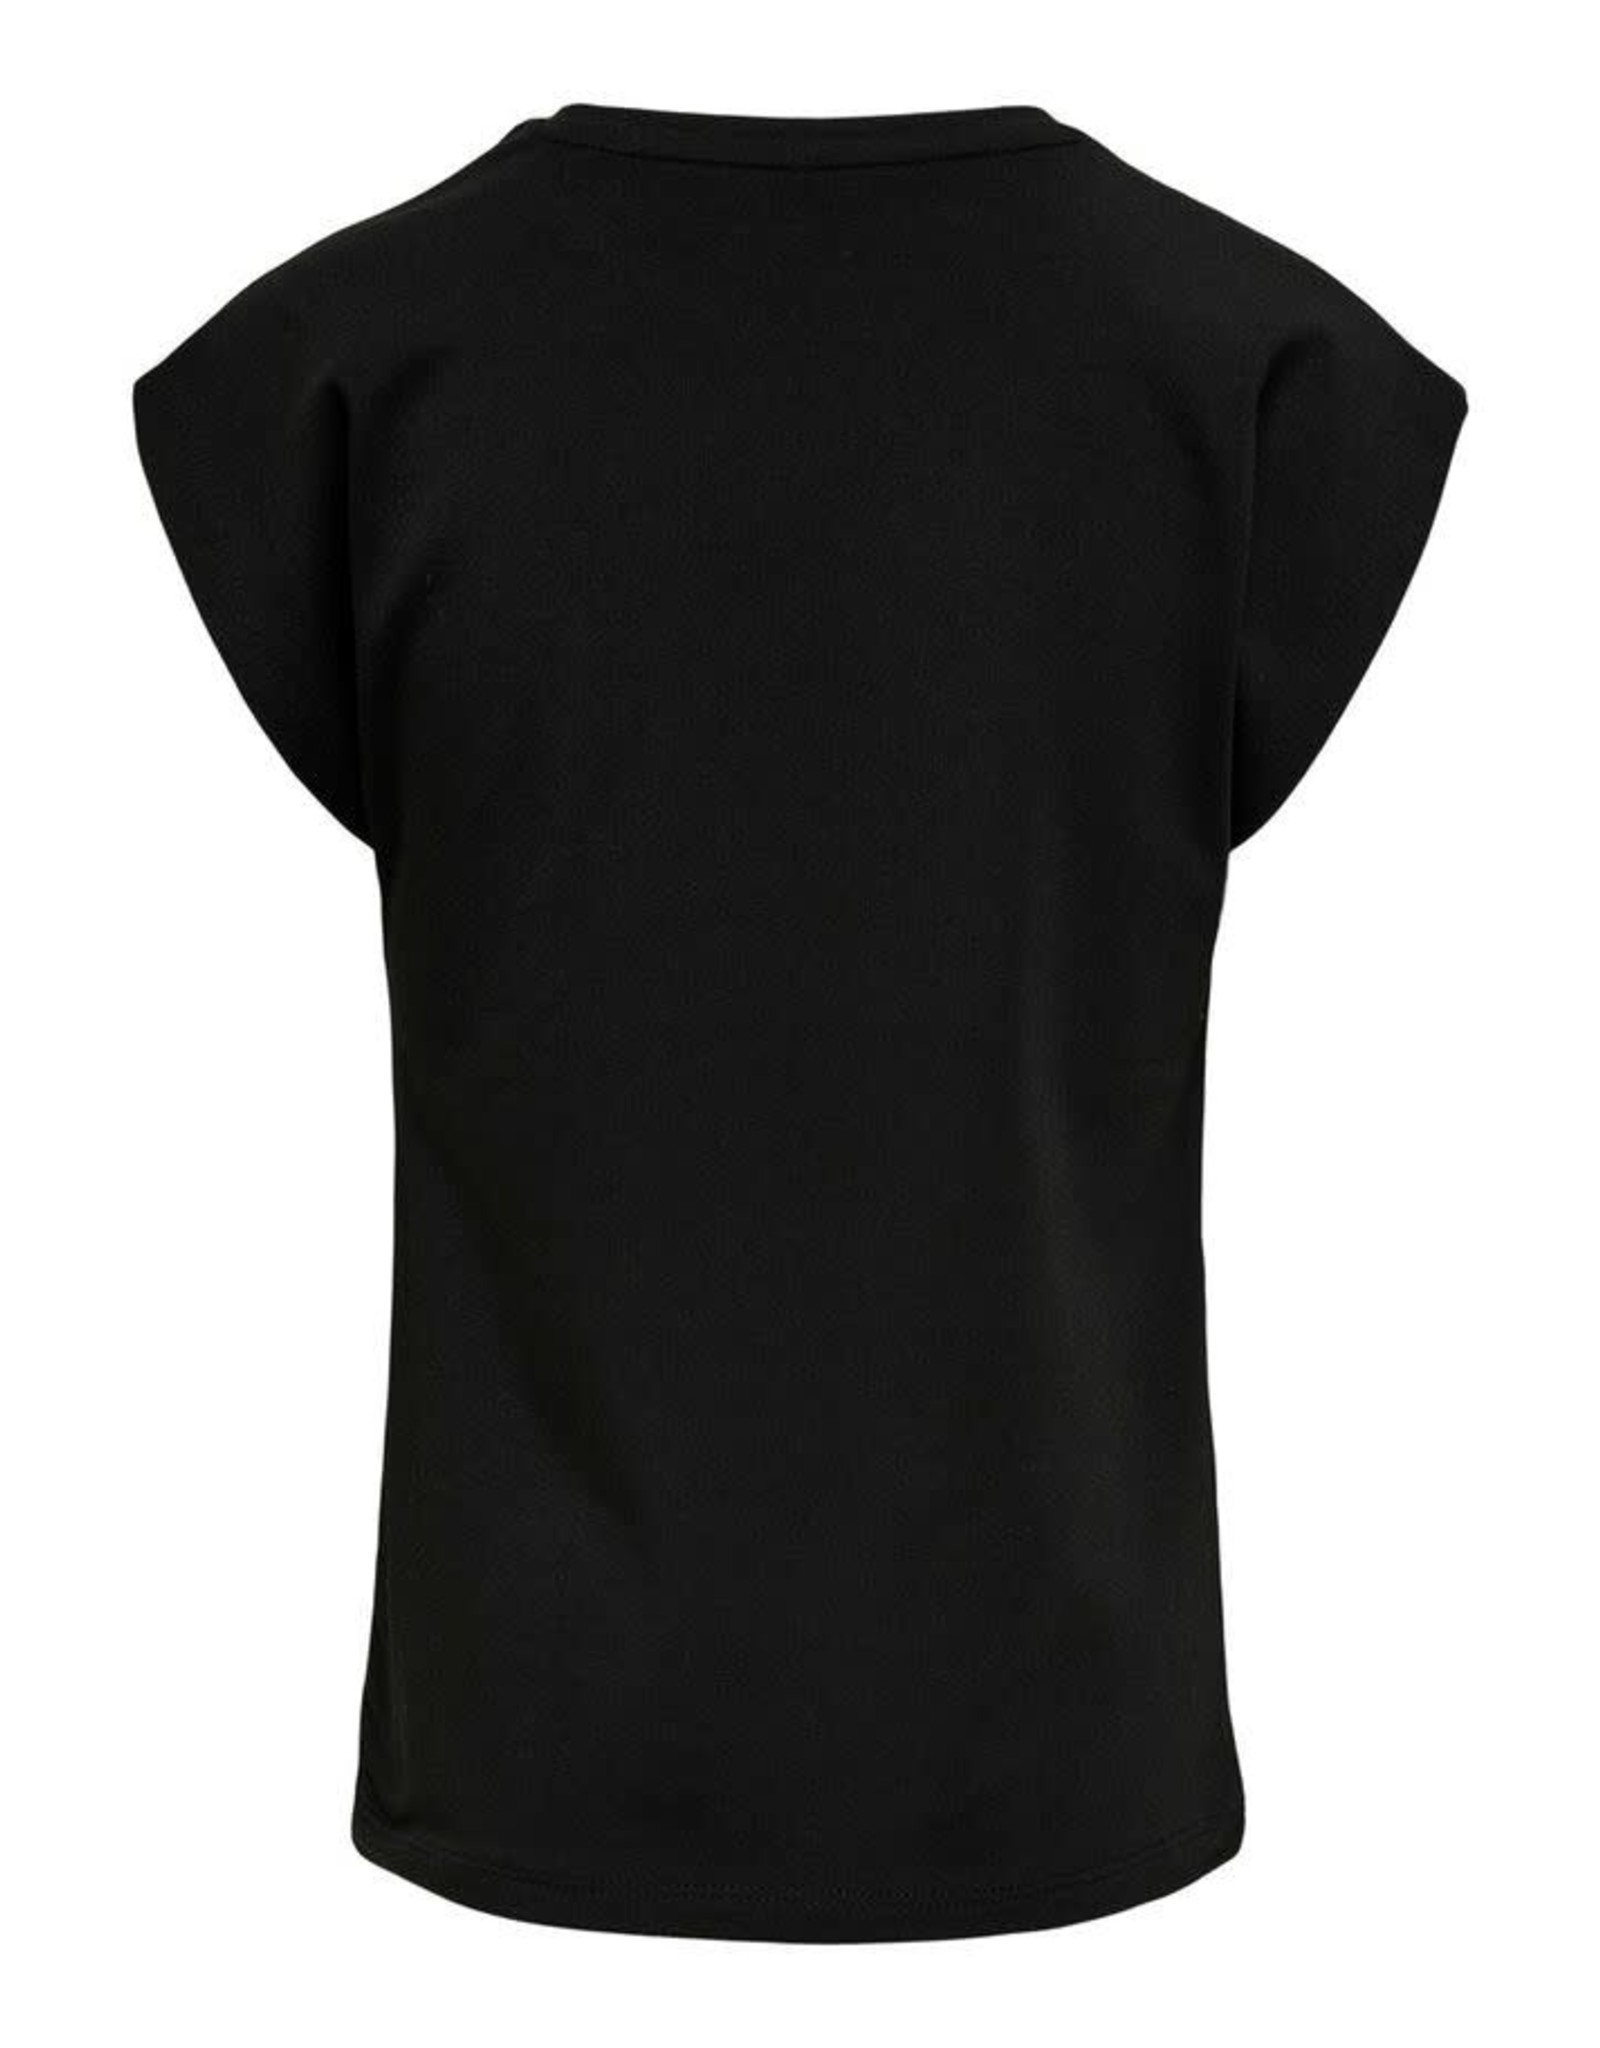 KIDS ONLY Zwarte losse t-shirt